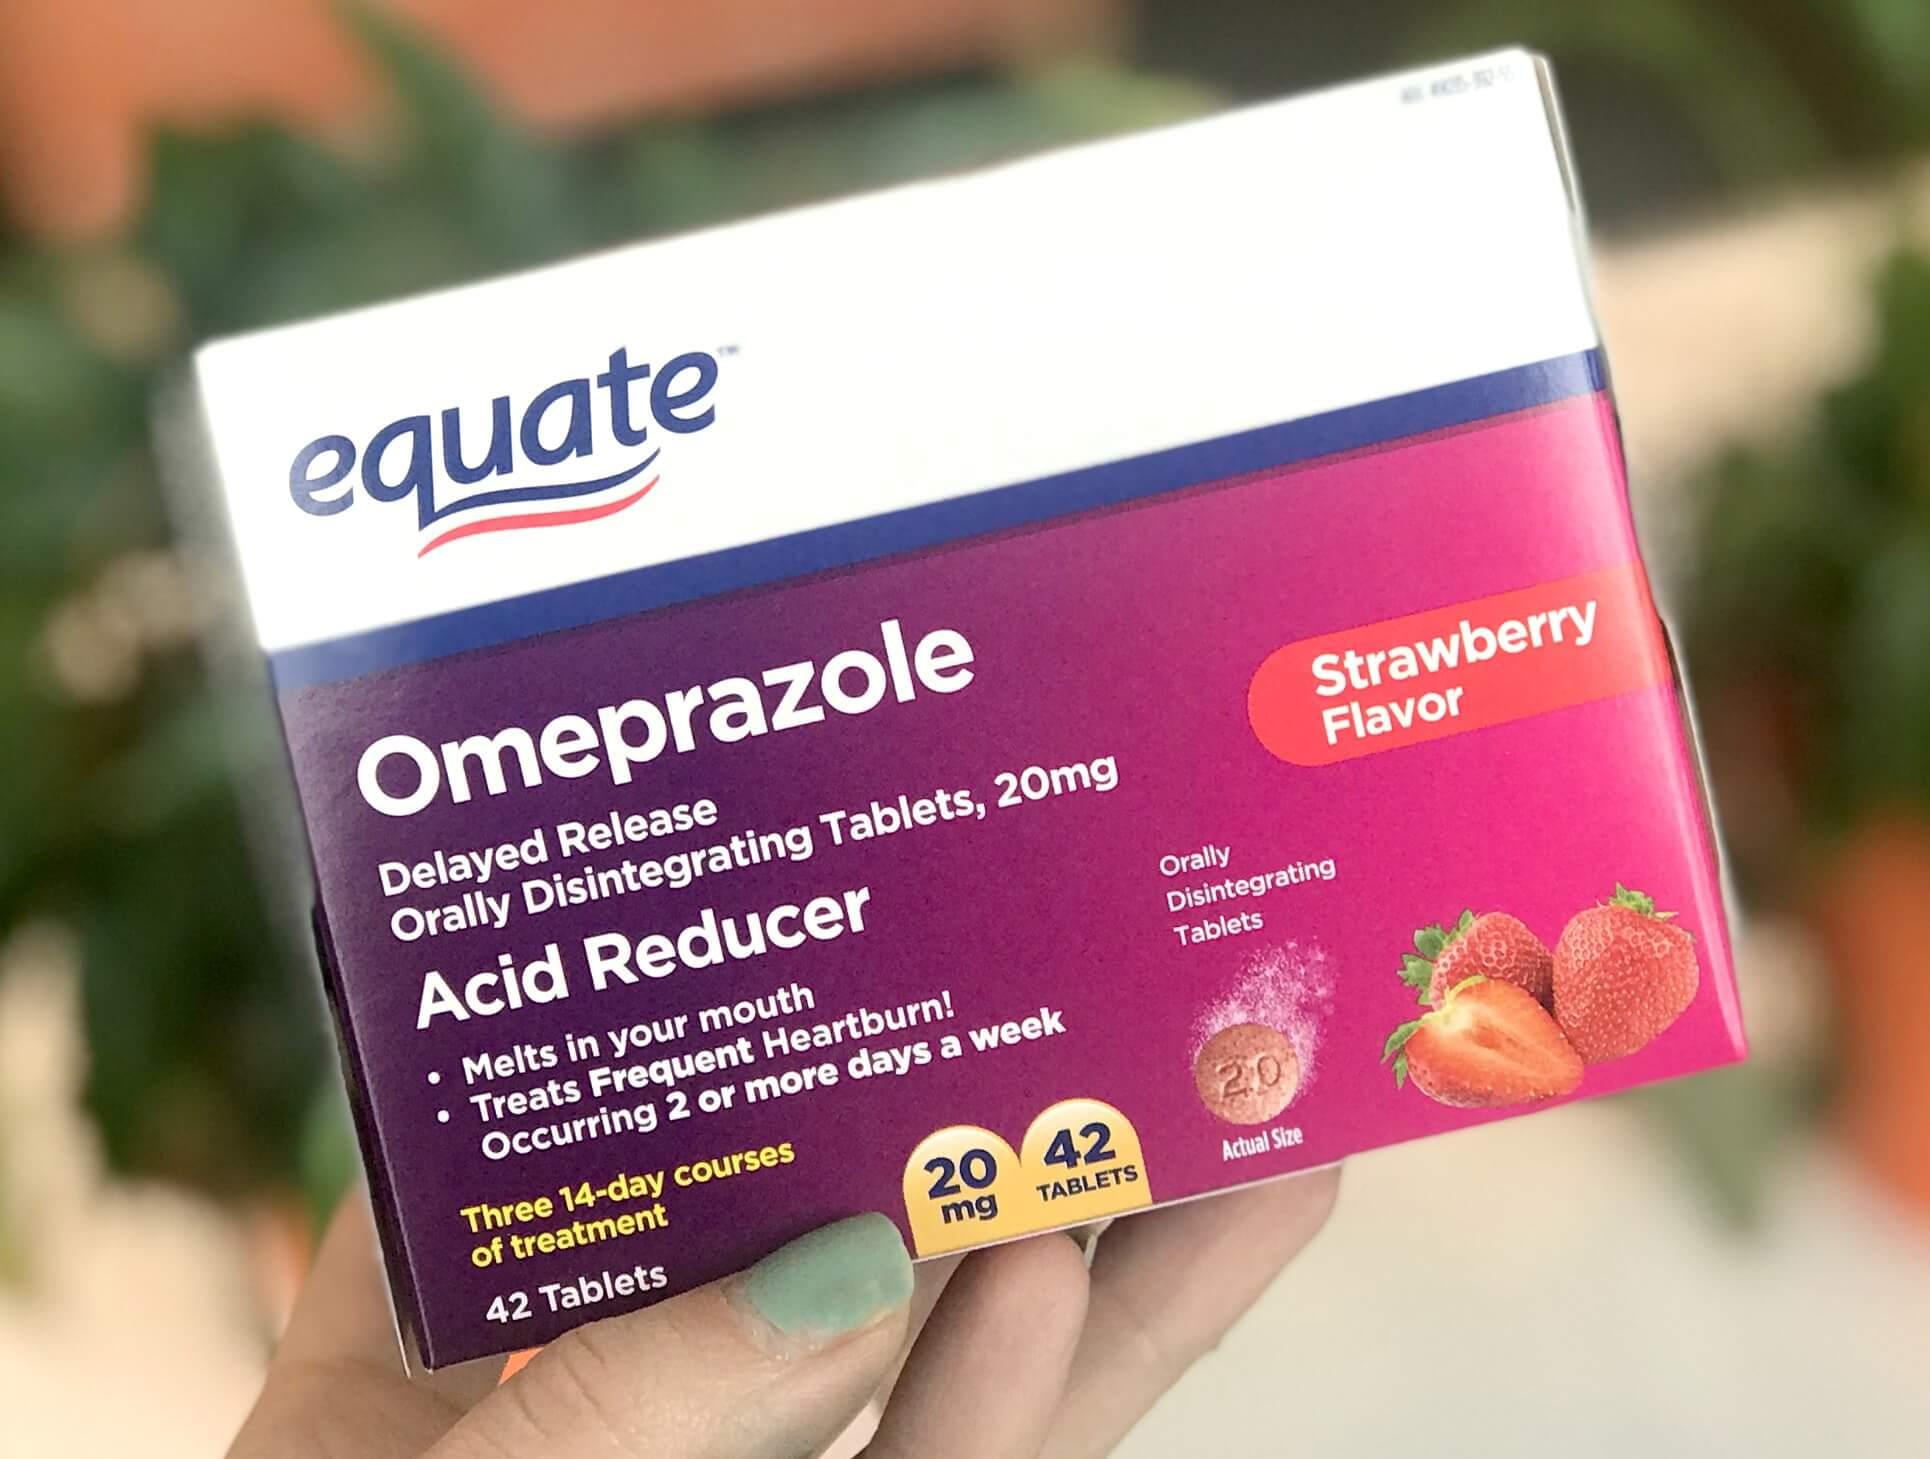 New High Value 3 Equate Omeprazole Orally Disintegrating